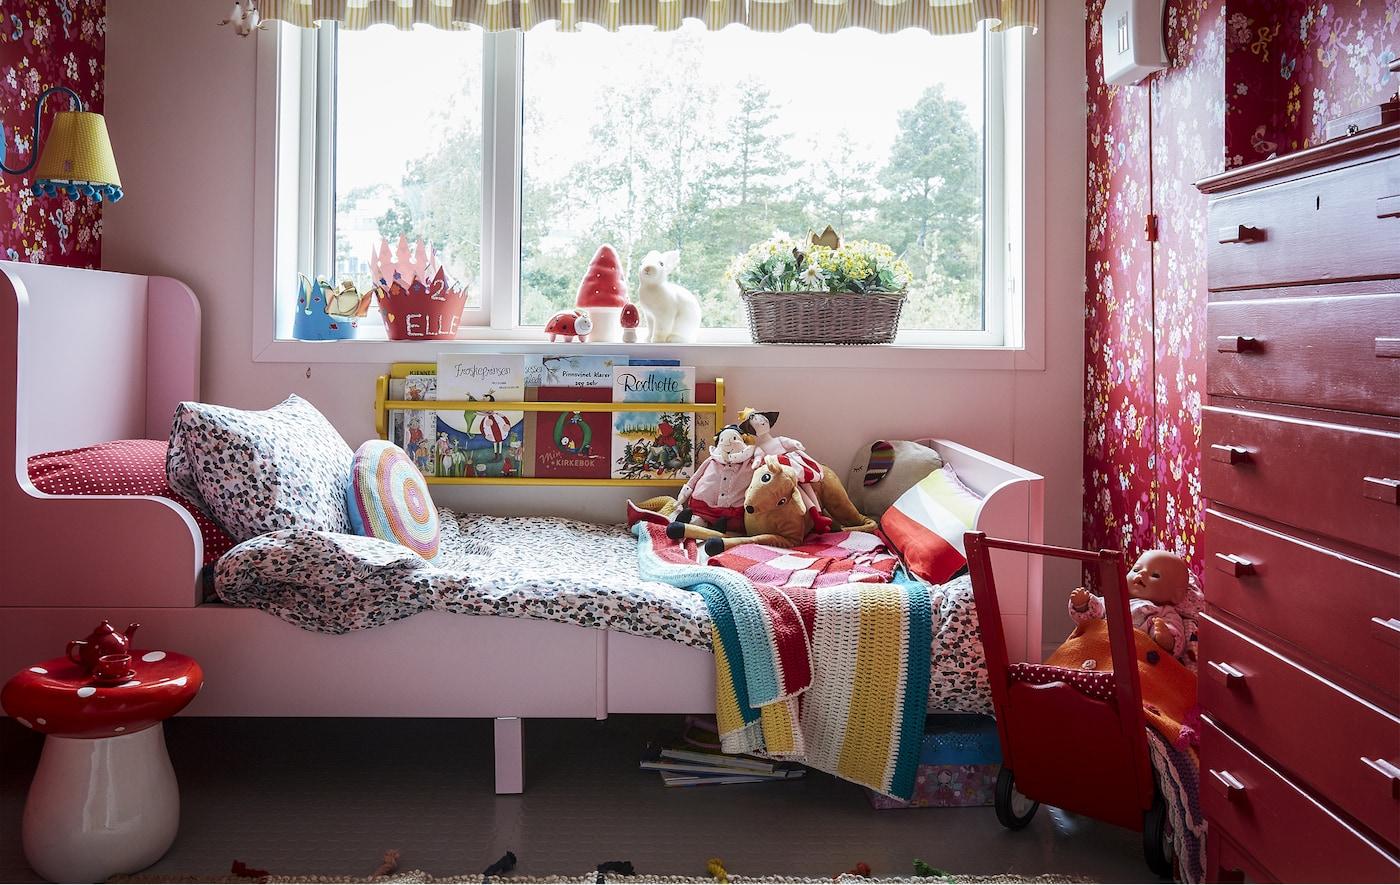 Dečja soba ukrašena crvenom bojom i šarama.